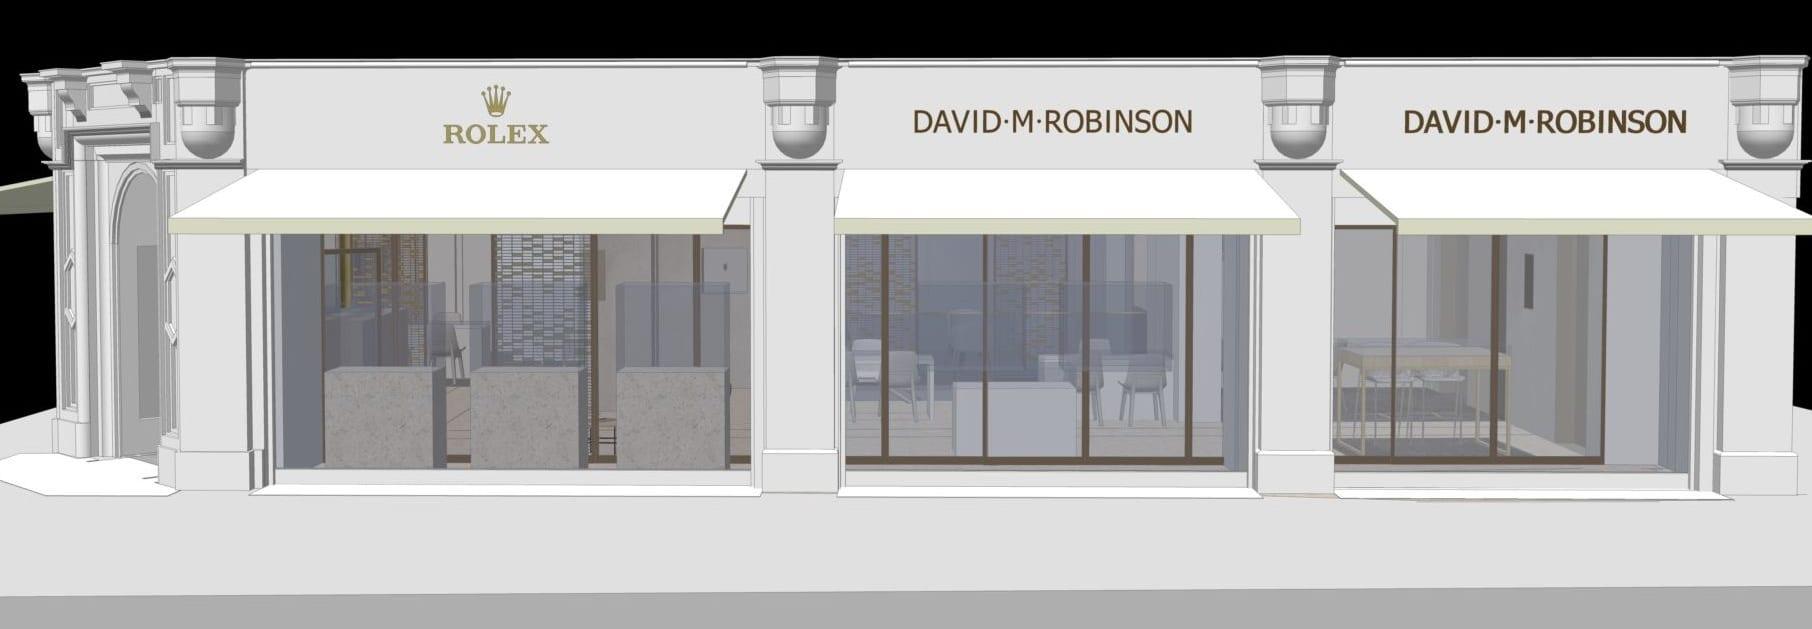 David M Robinson Manchester